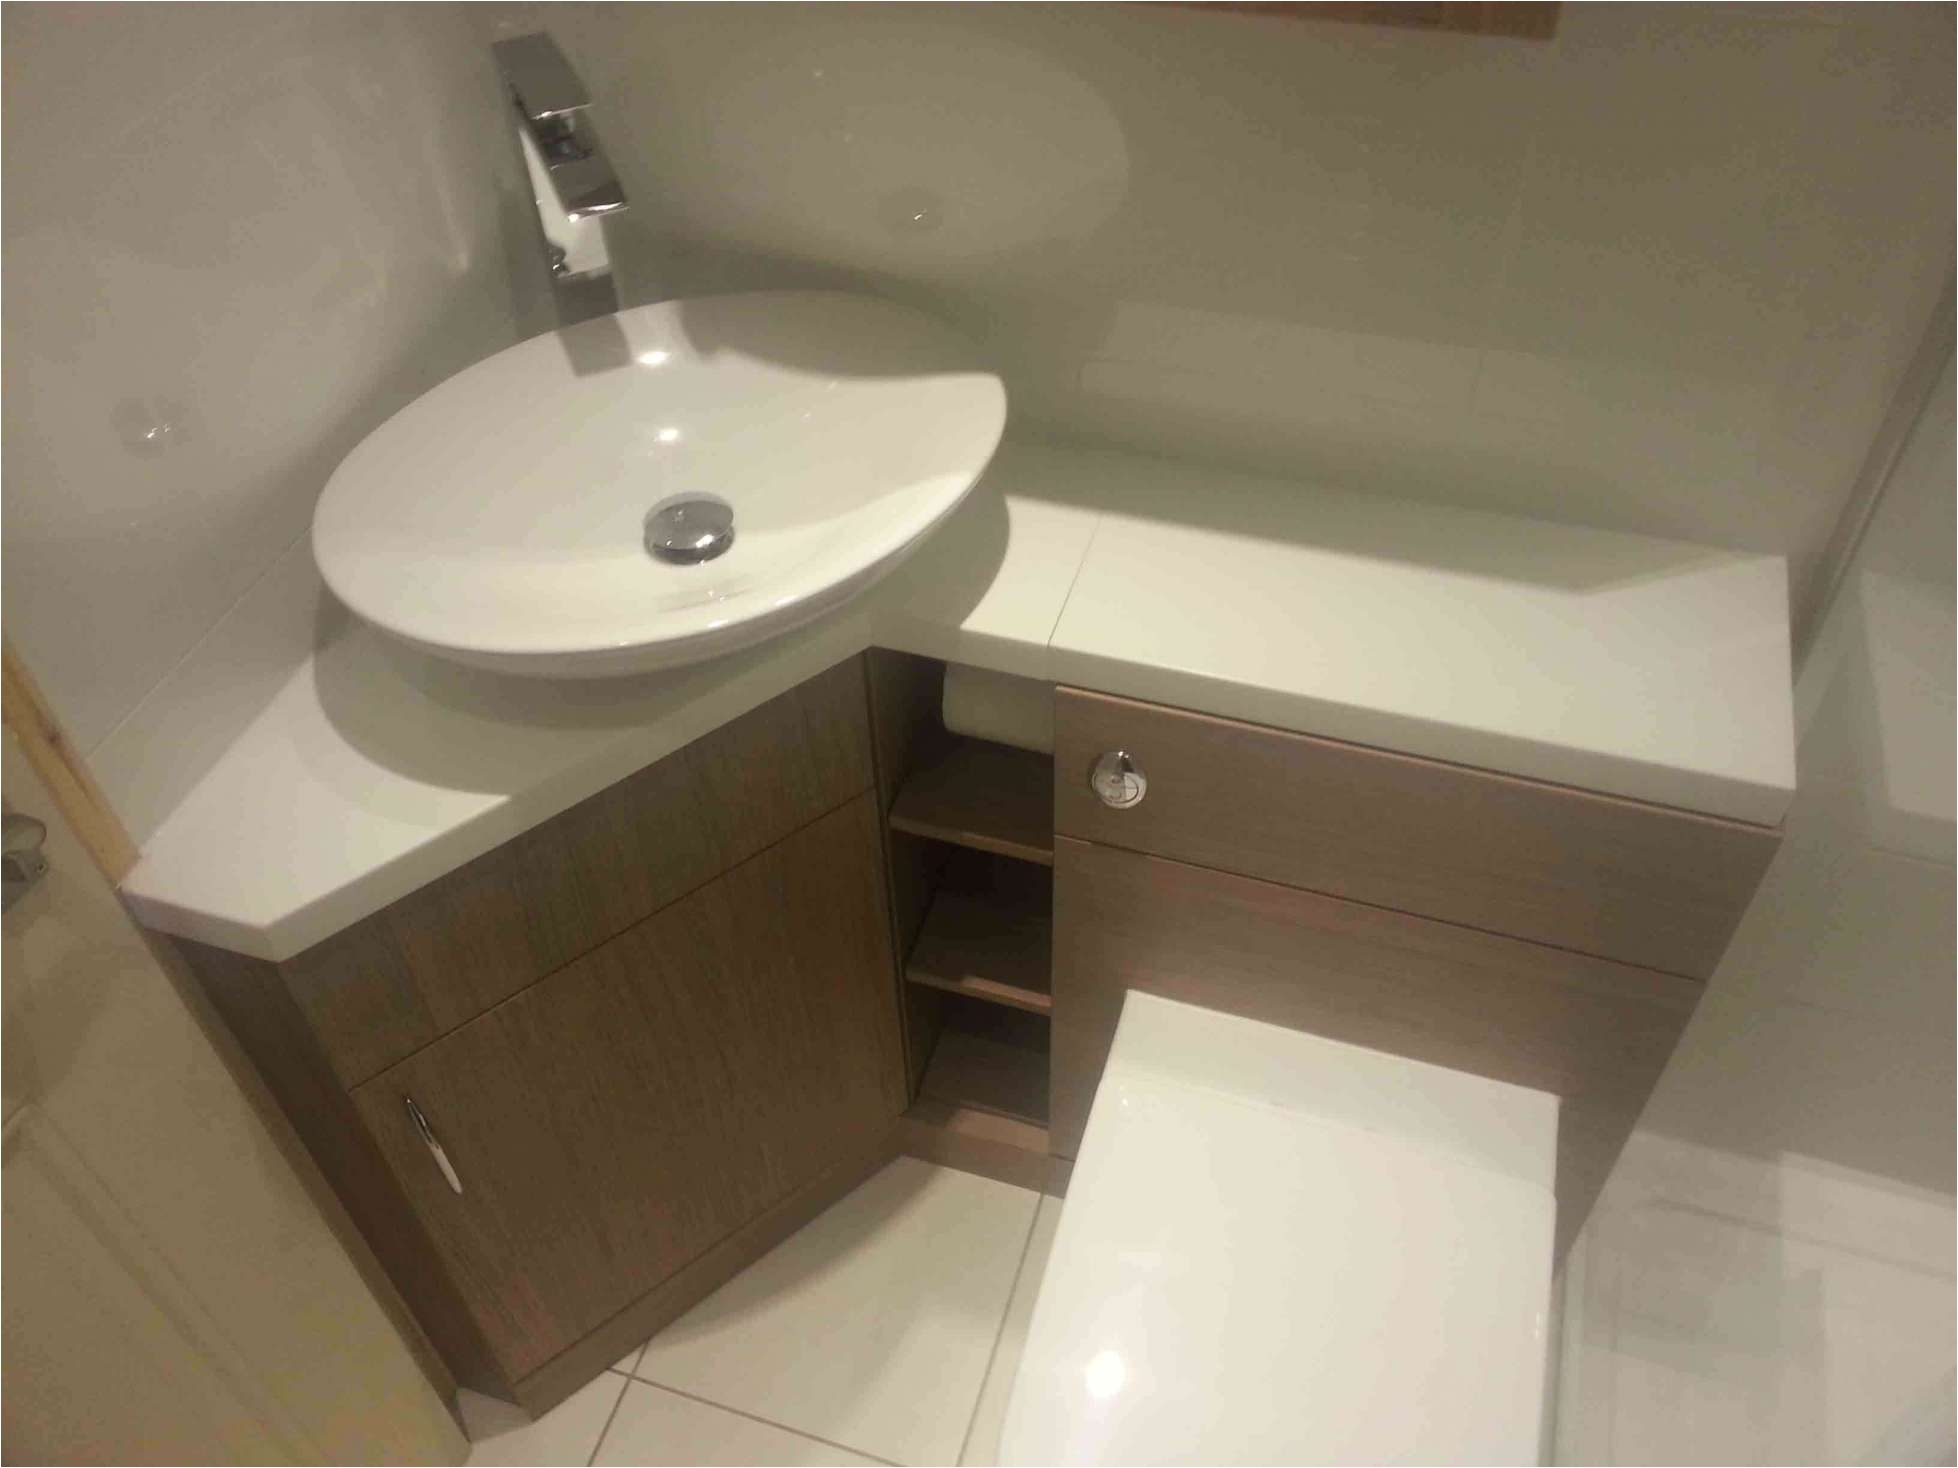 Interesting Custom Bathroom Mirrors With Bathroom Sink Design Ideas Lovely H Sink Install Bathroom I 0d